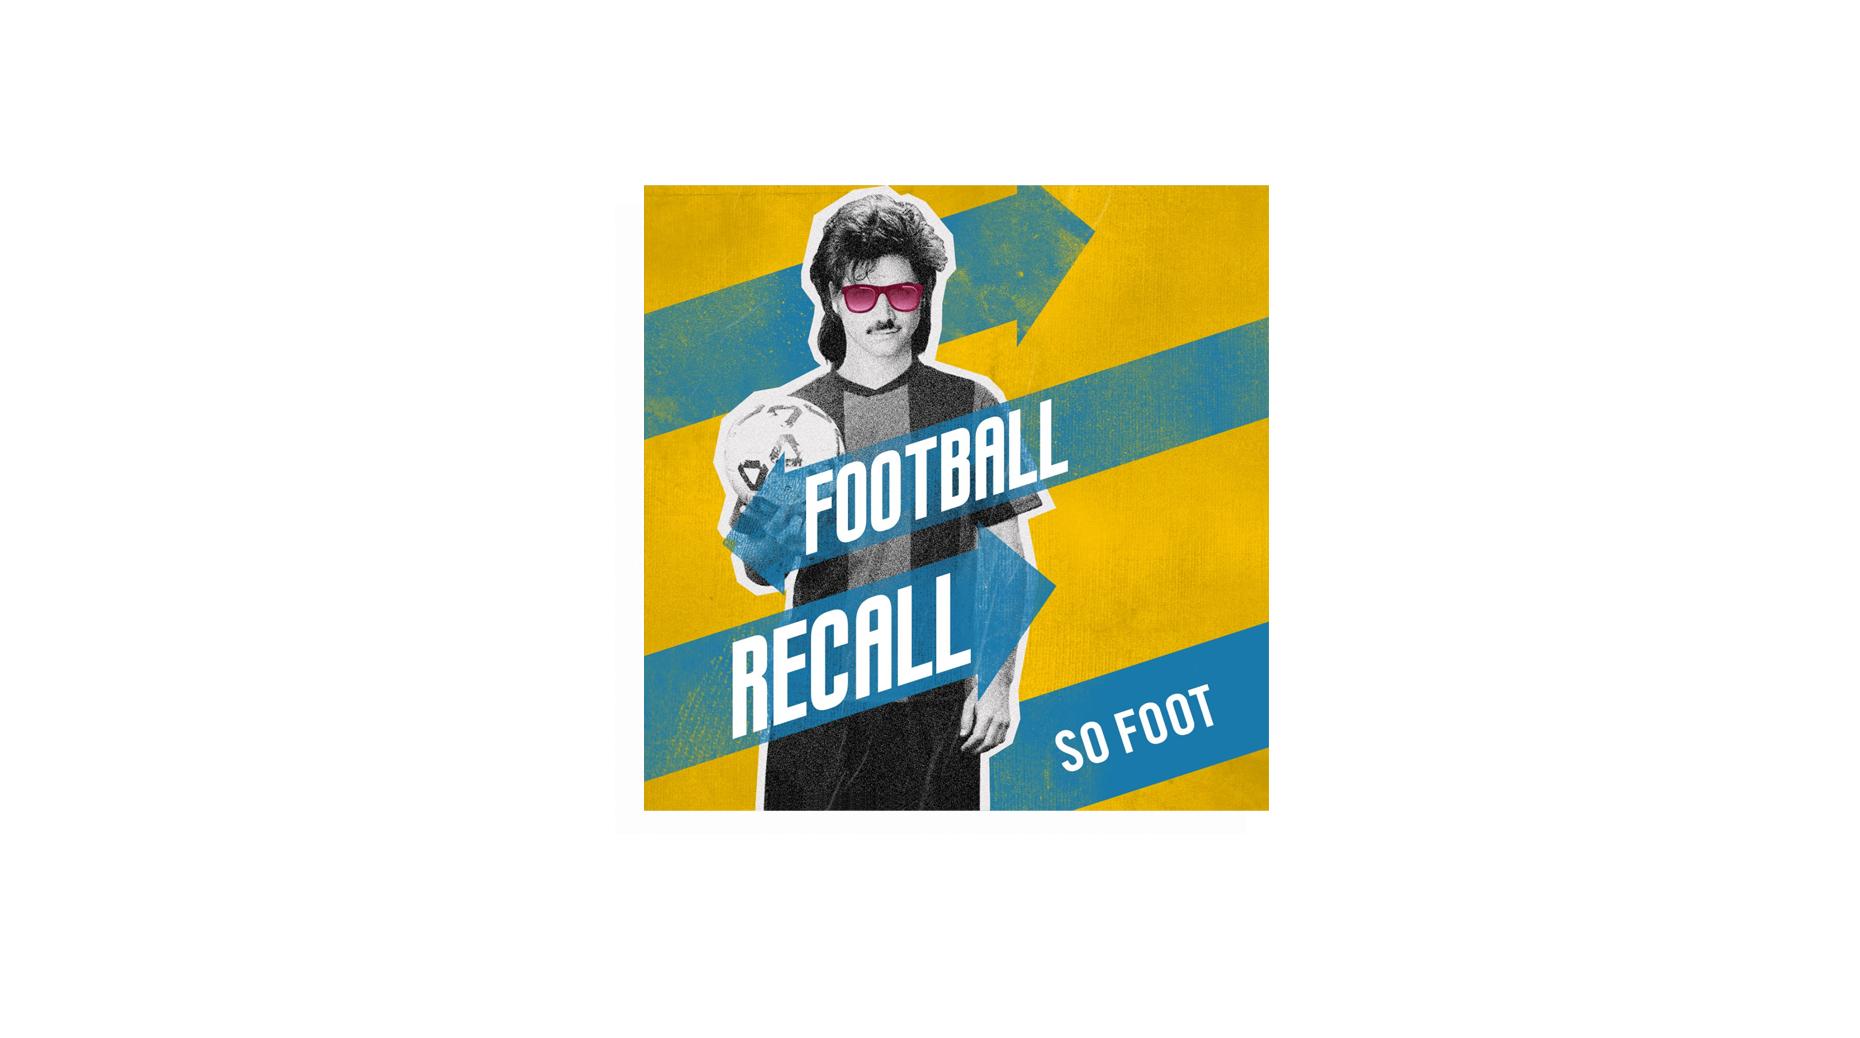 Football Recall